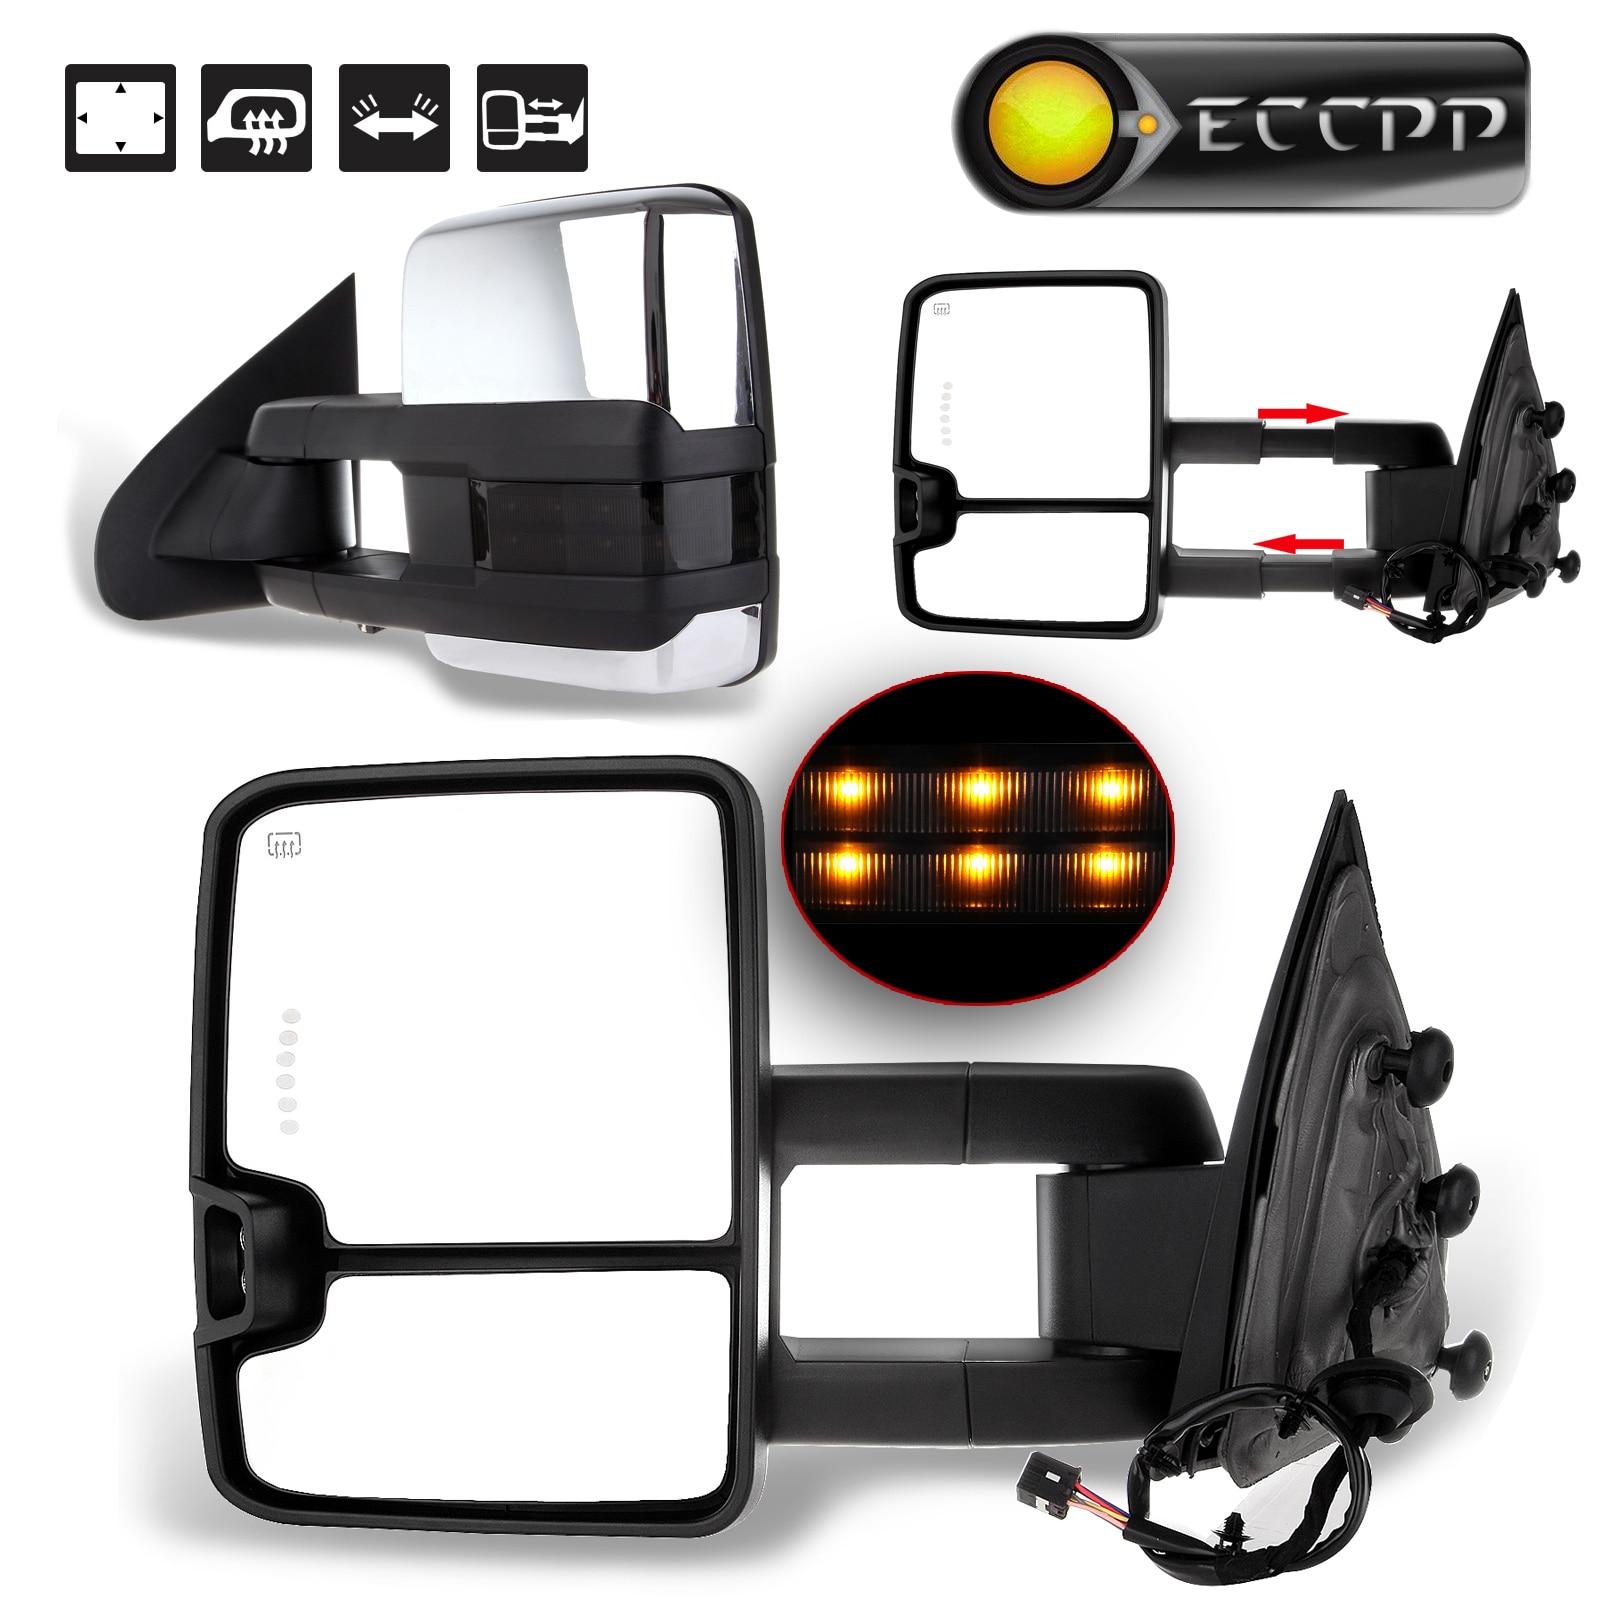 Eccpp towing mirror for 2014 2015 2016 2017 chevy silverado gmc sierra tow side power heated